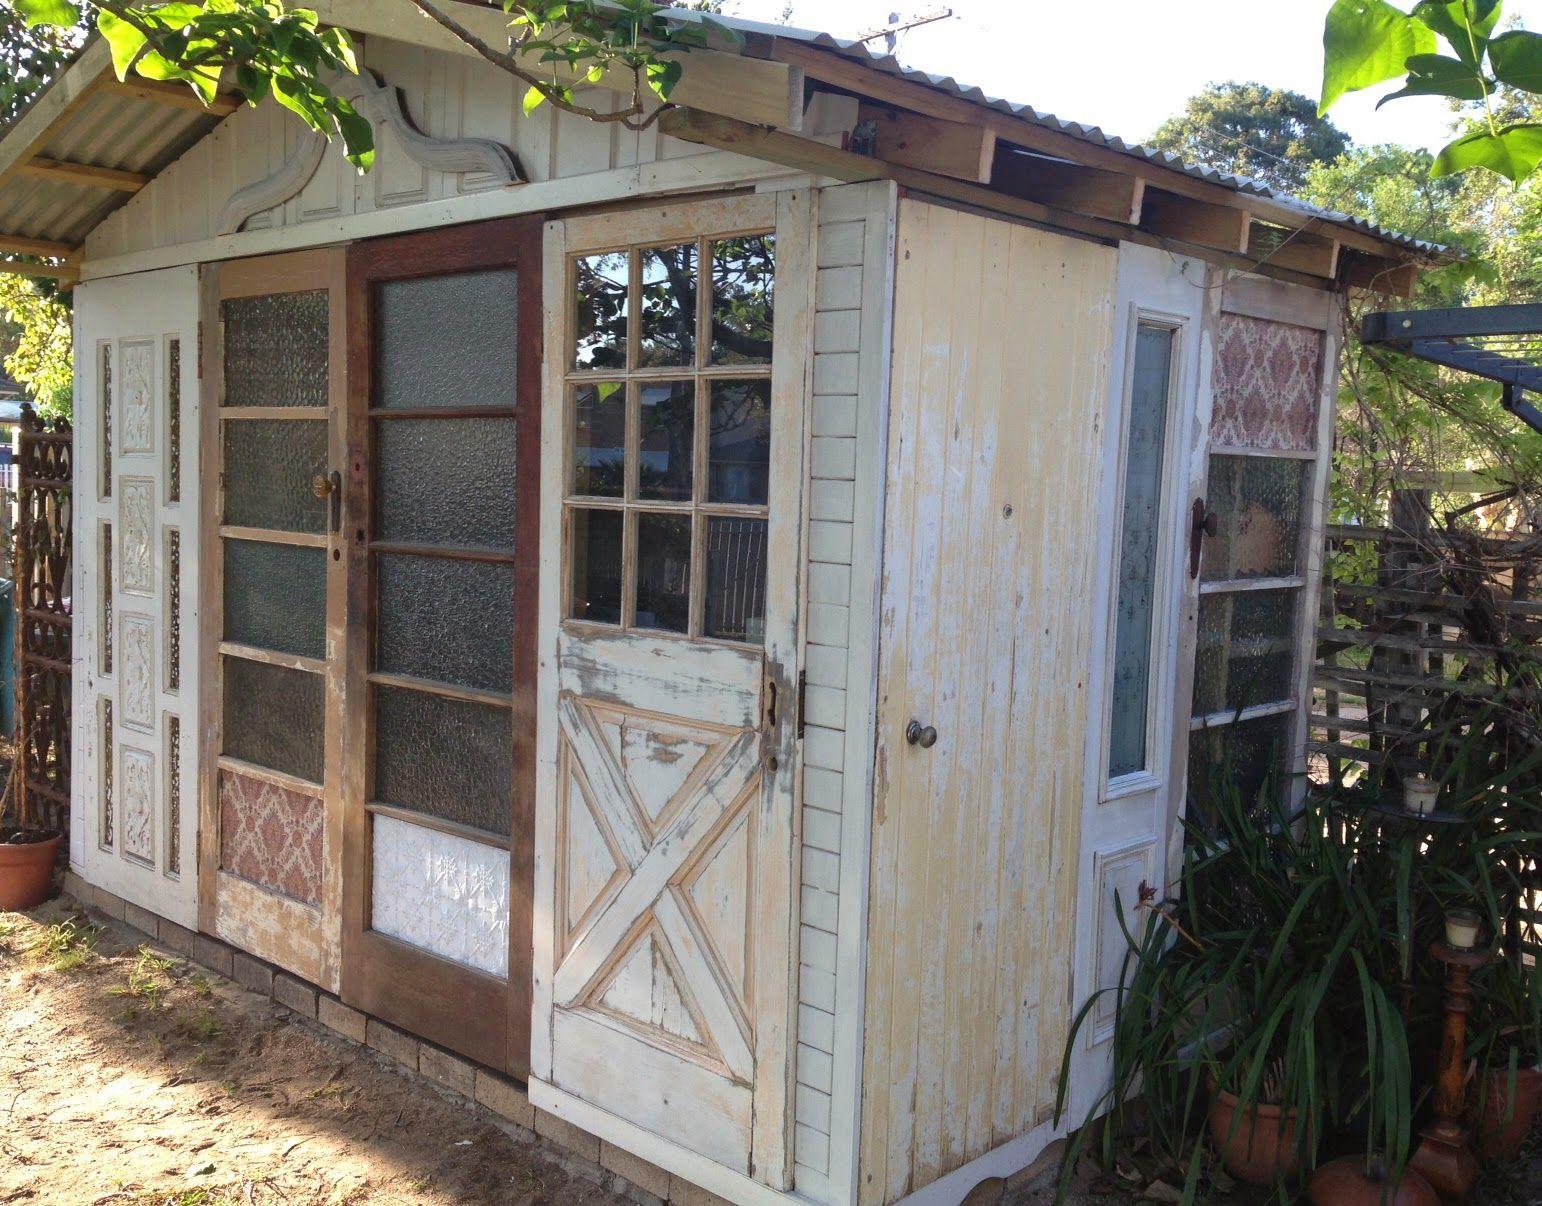 Recycled Door Garden Shed Backyard shed, Recycled door